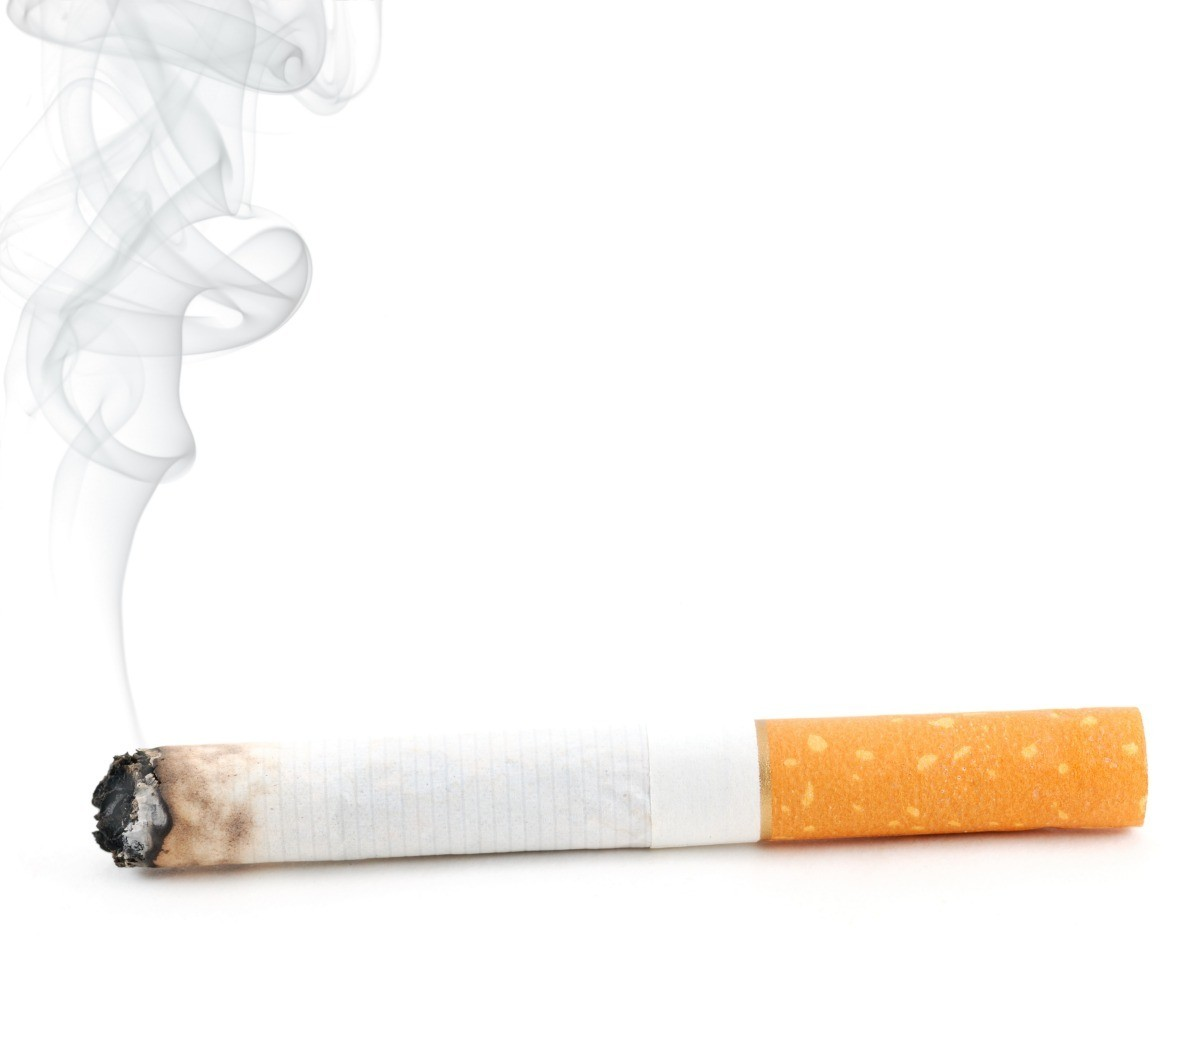 Repairing Cigarette Burns On Leather